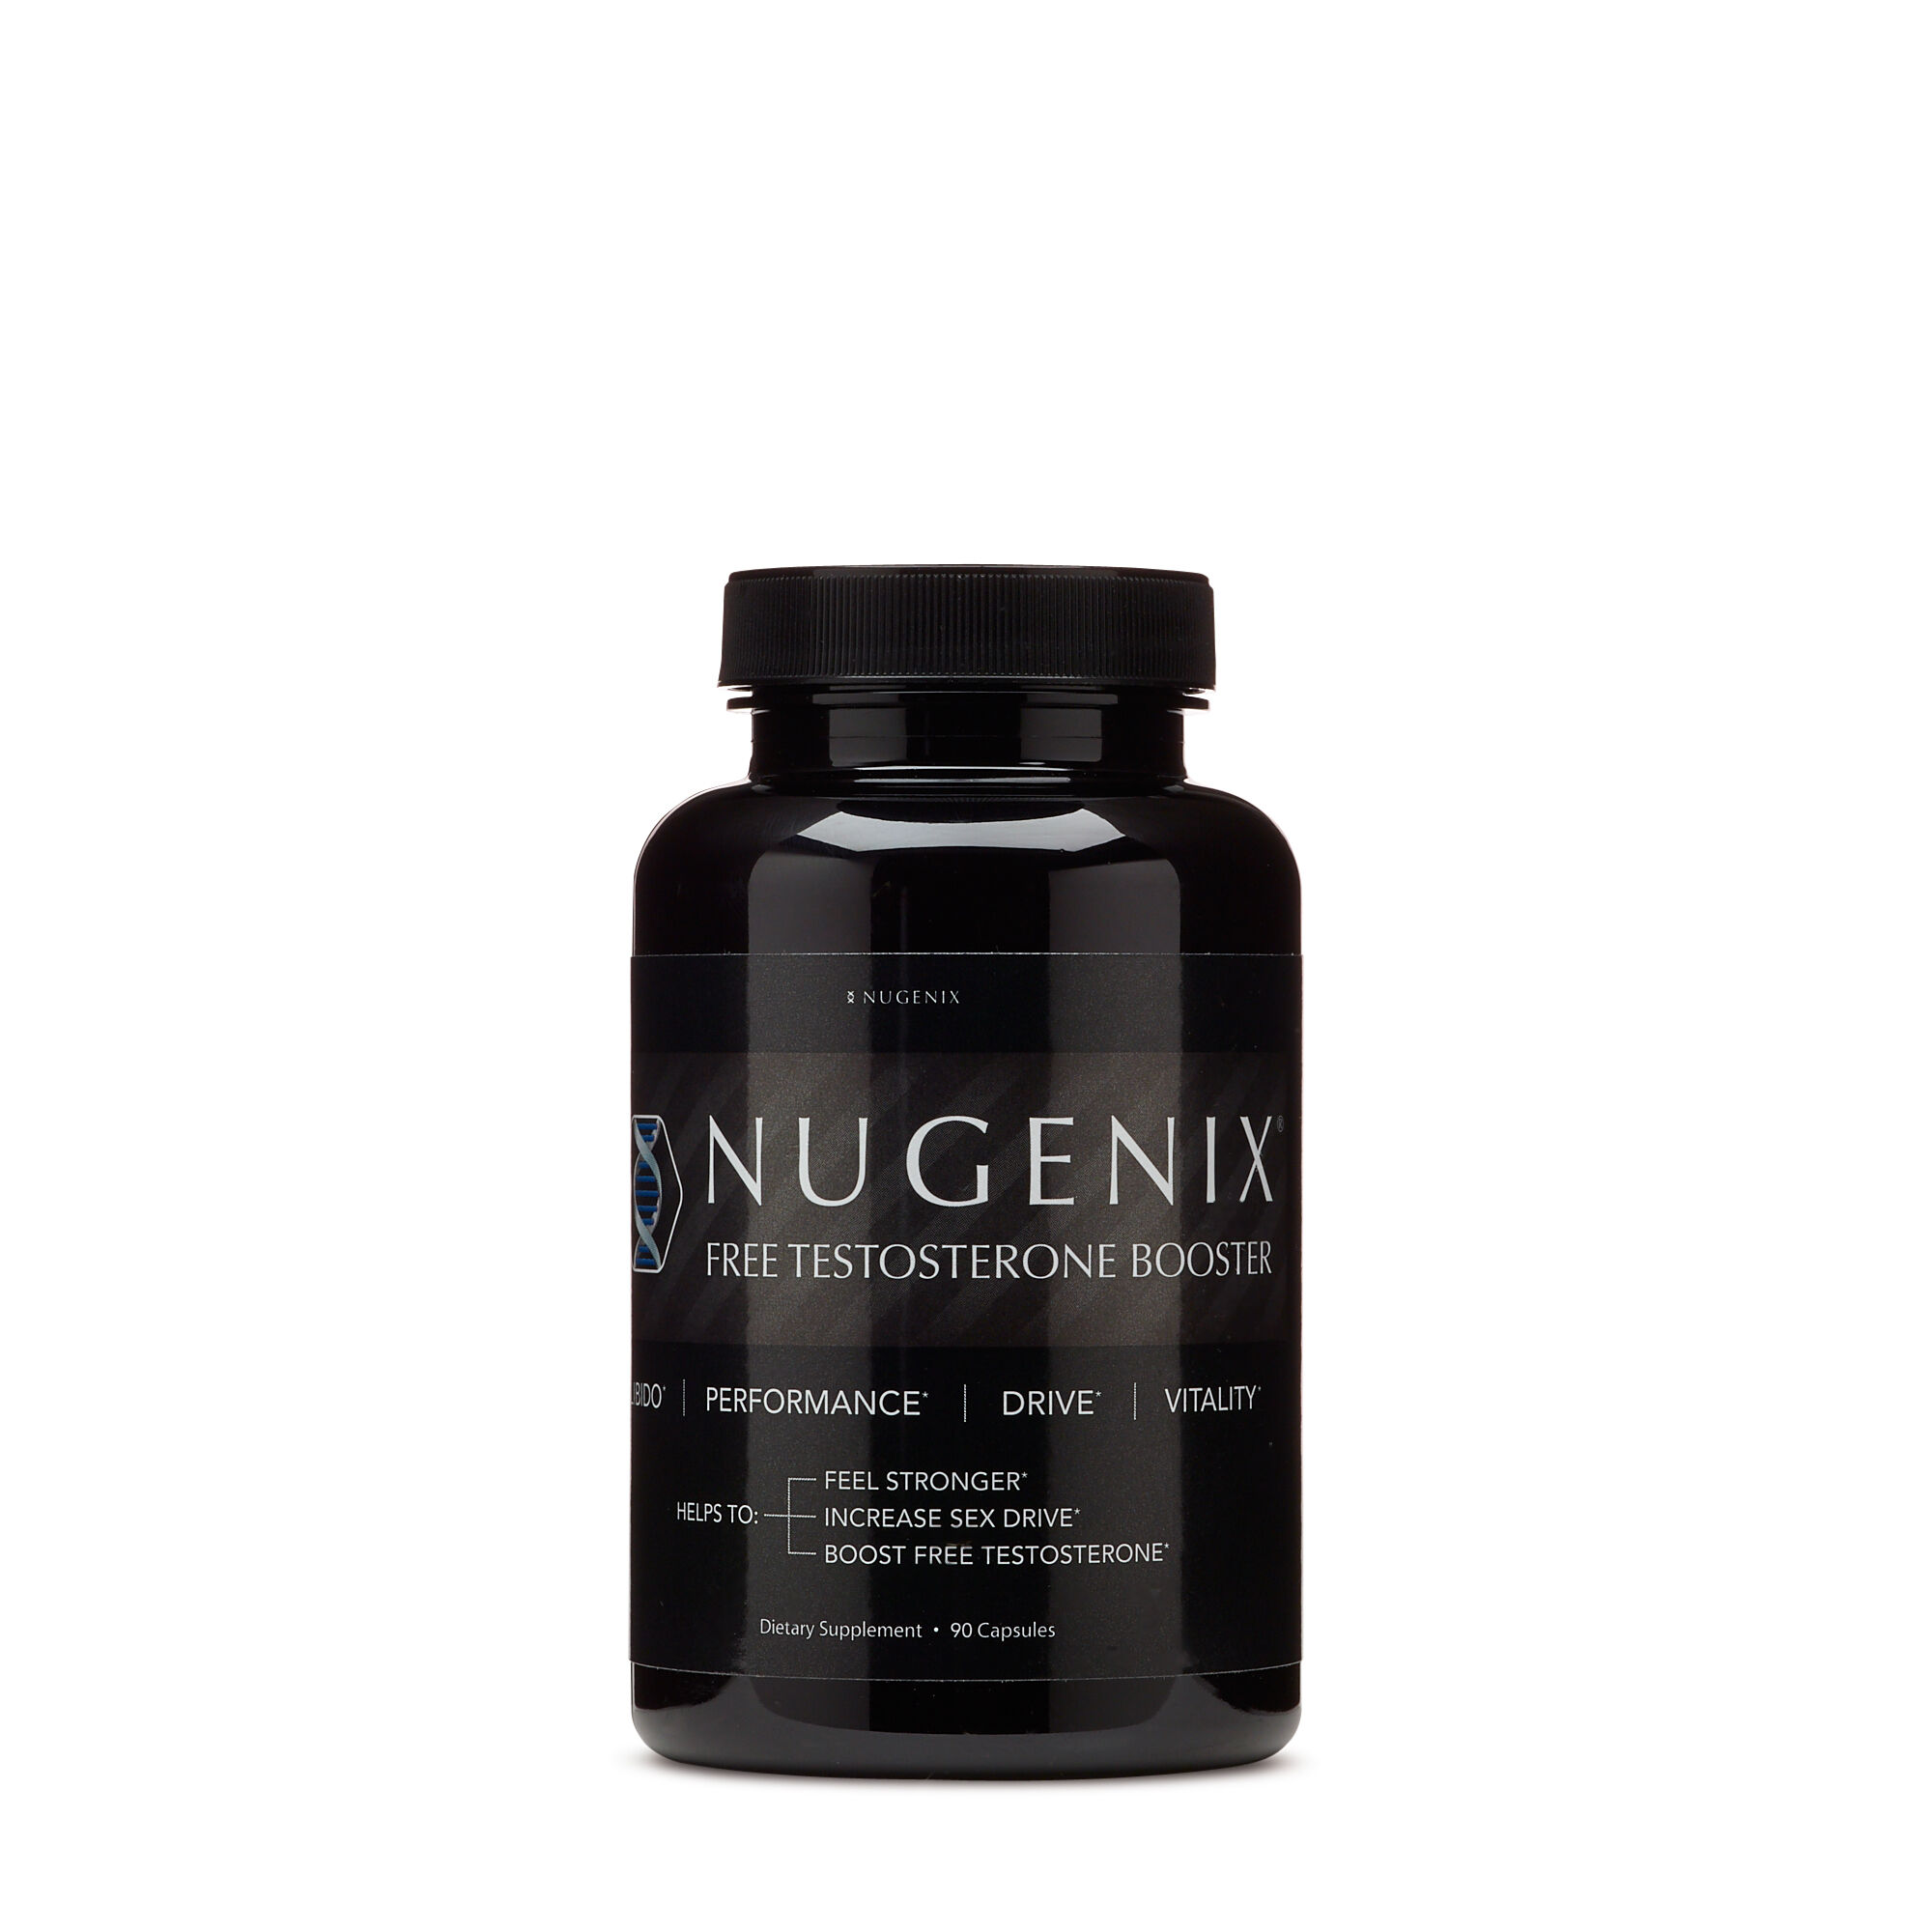 GNC 누제닉스 테스토스테론 부스터 GNC Nugenix Testosterone Booster